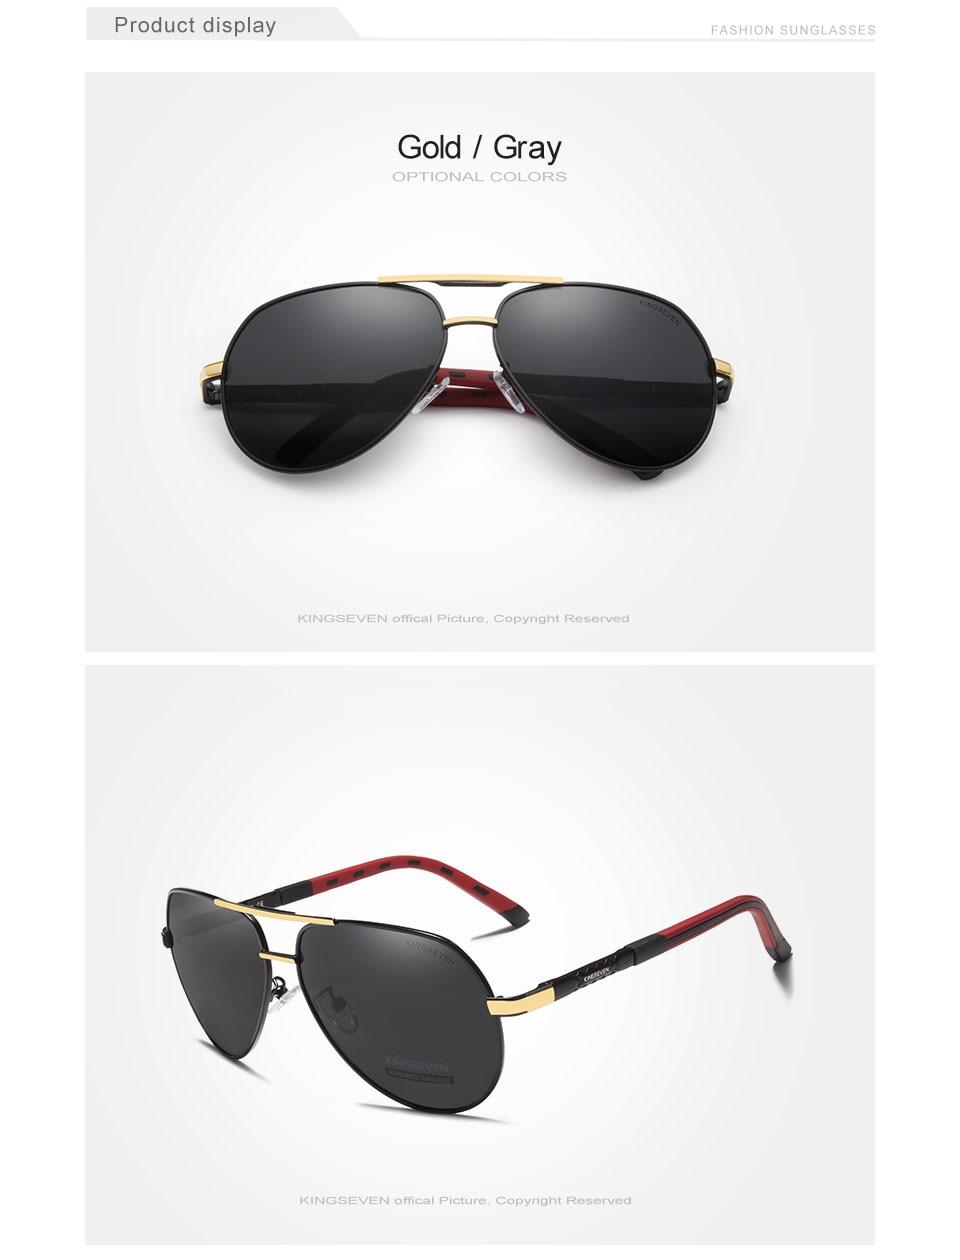 HTB1GY4jbyfrK1RjSspbq6A4pFXaz 7-Day Delivery GIFTINGER Vintage Aluminum Polarized Sunglasses Brand Sun glasses Coating Lens Driving EyewearFor Men/Wome N725